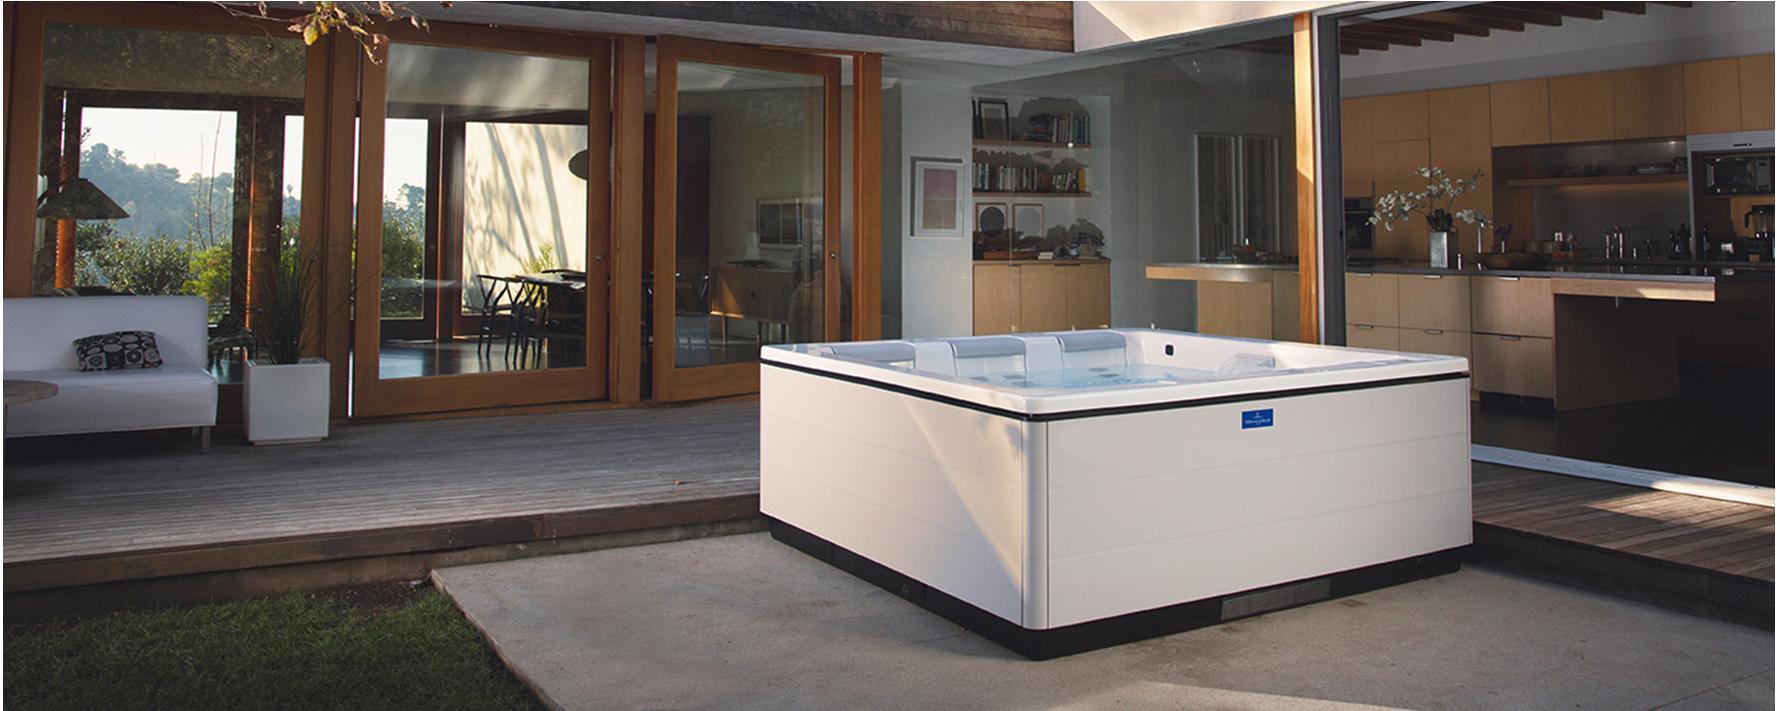 die welt der outdoor whirlpools sauna spa profi. Black Bedroom Furniture Sets. Home Design Ideas